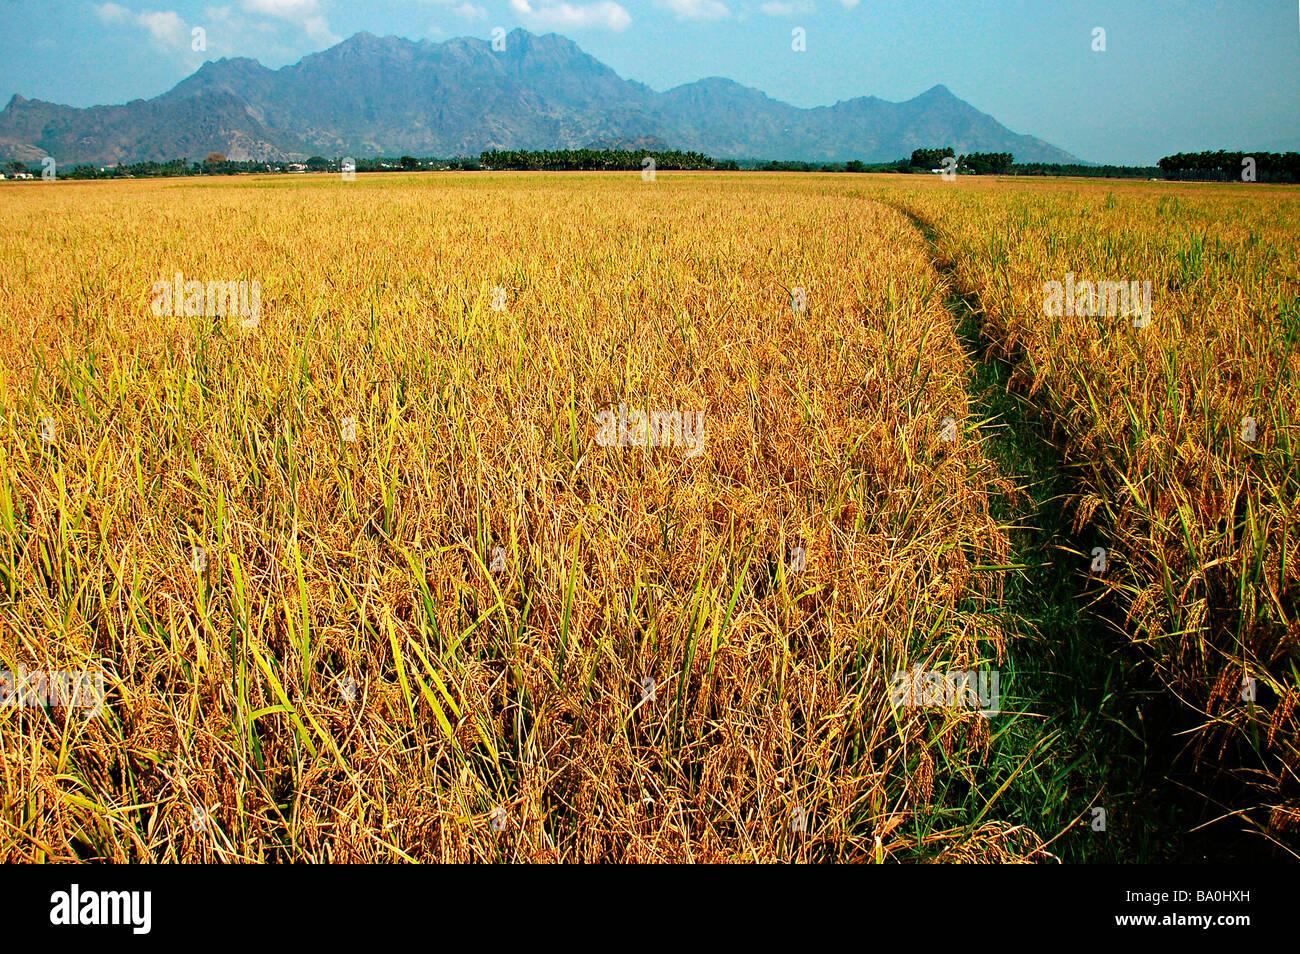 A rice Field at Kannyakumari District, Tamil Nadu - Stock Image